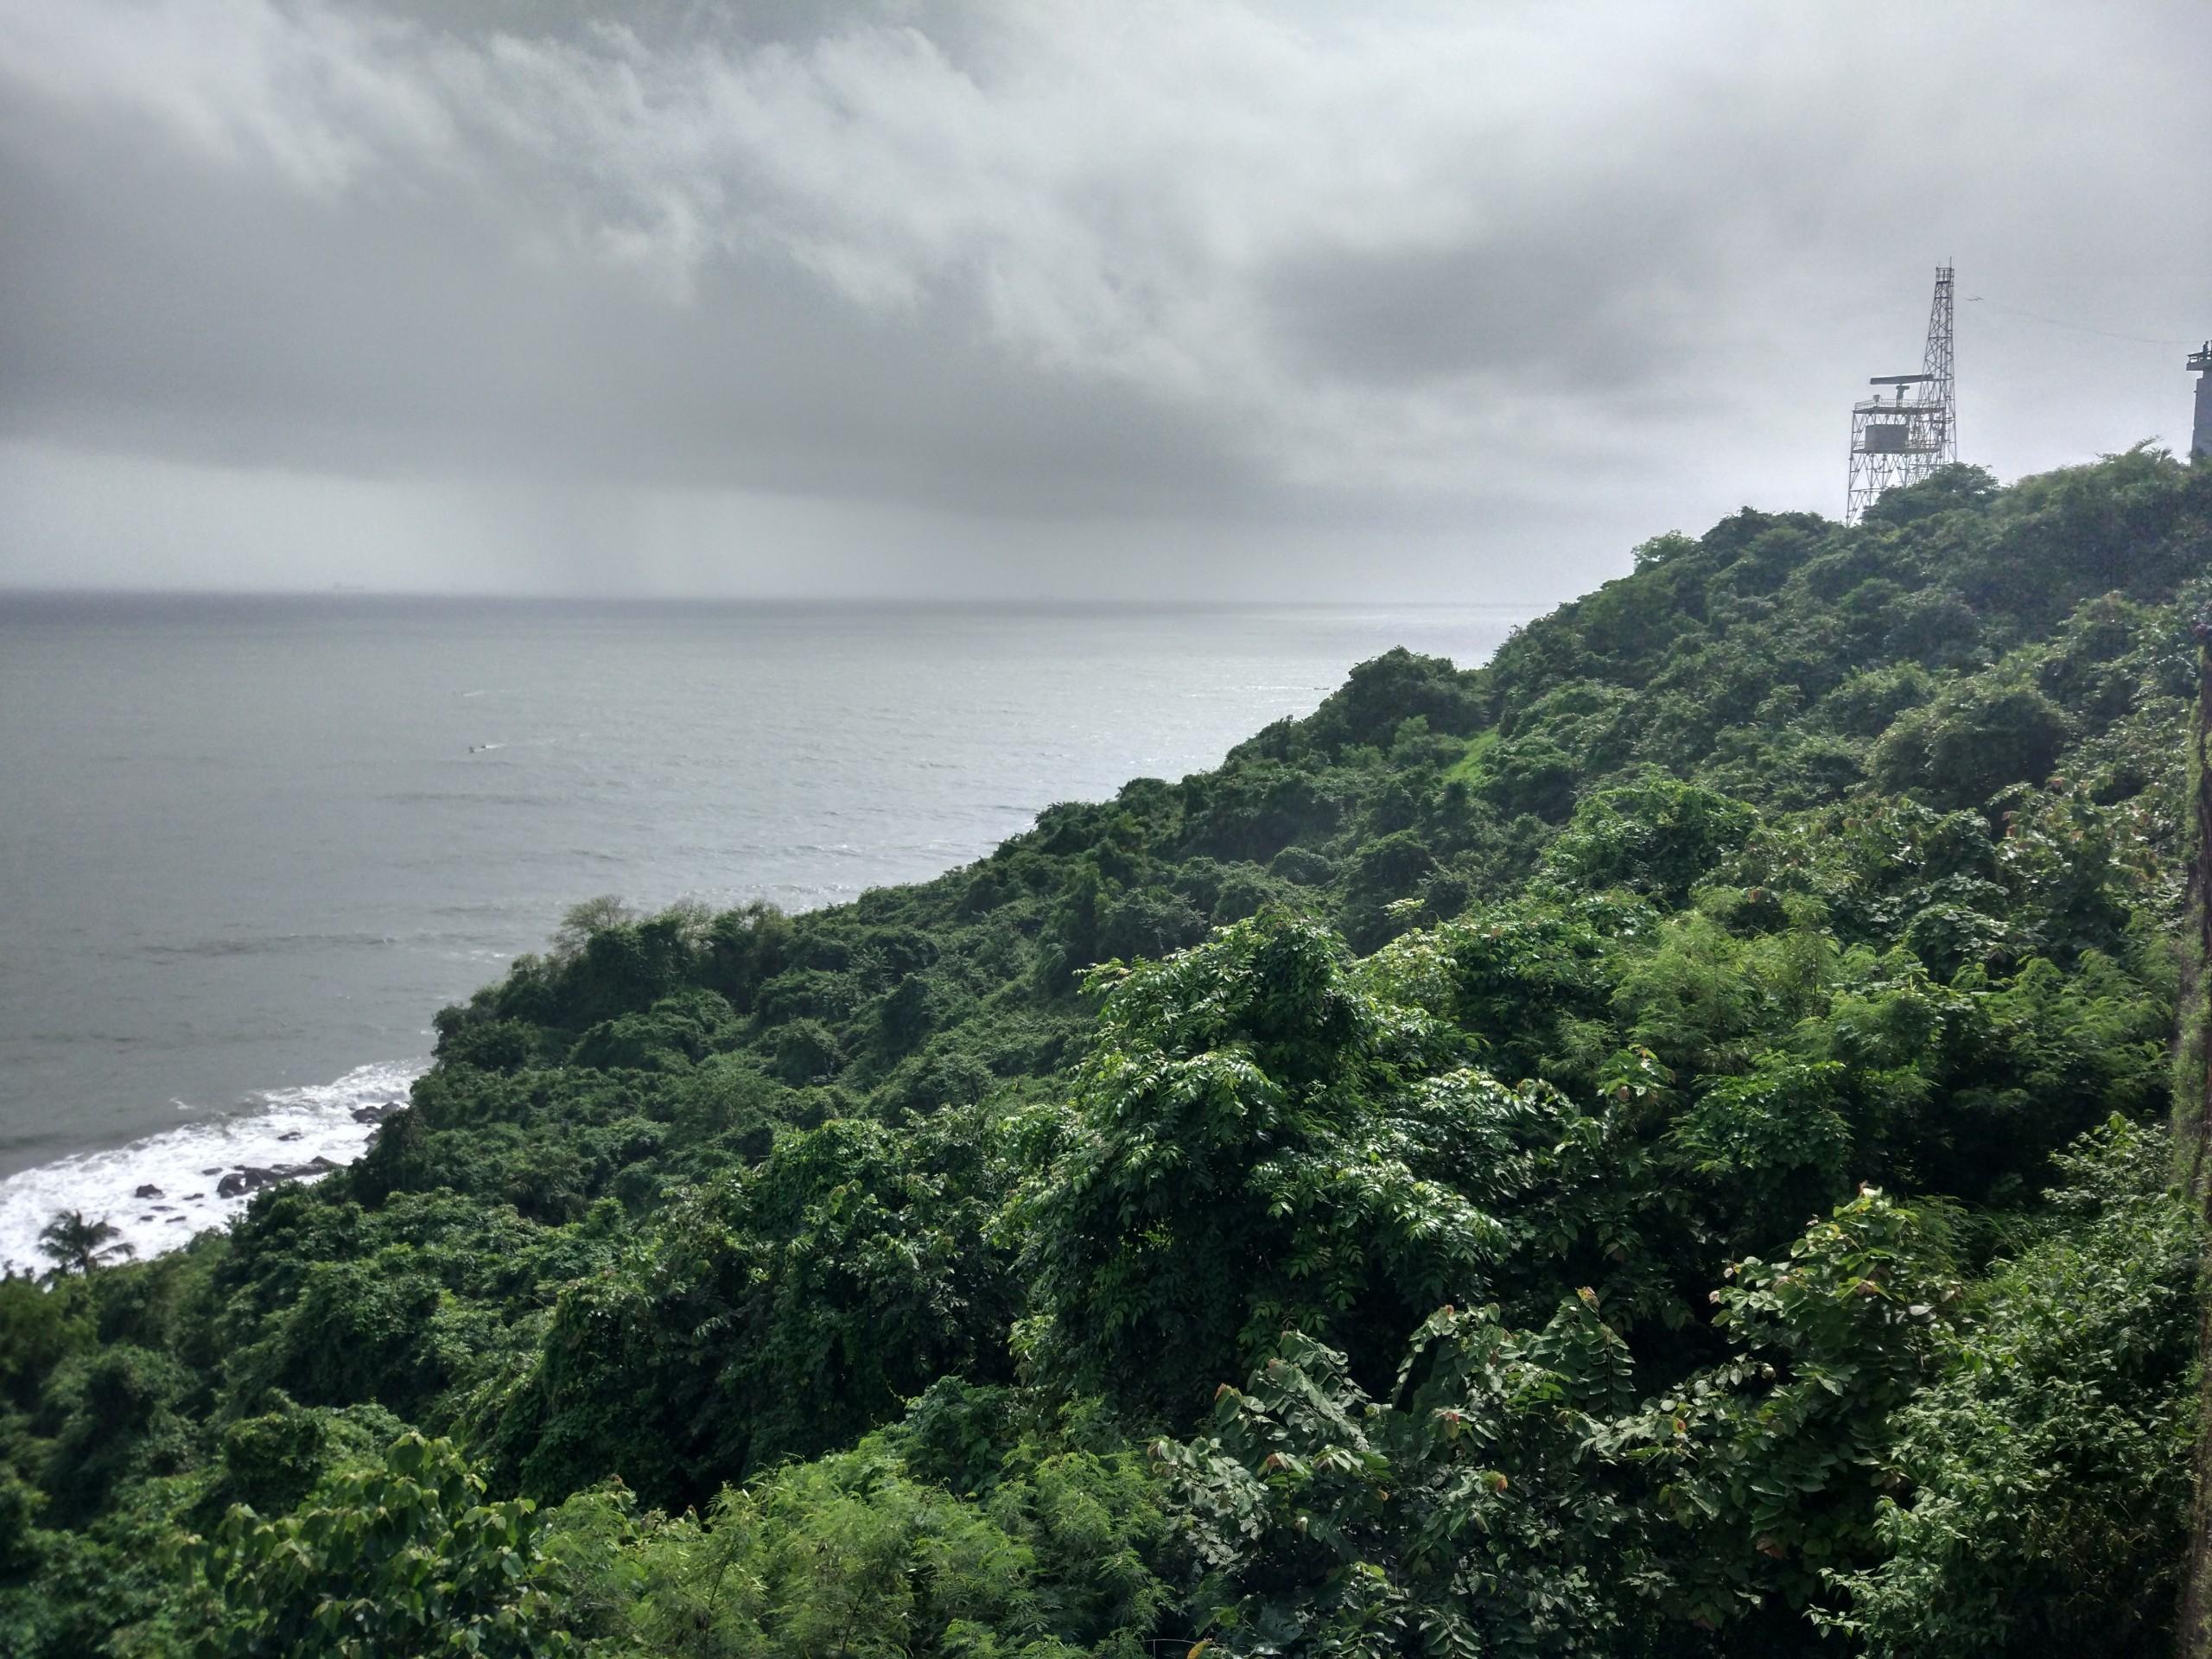 Cloudy weather in Goa